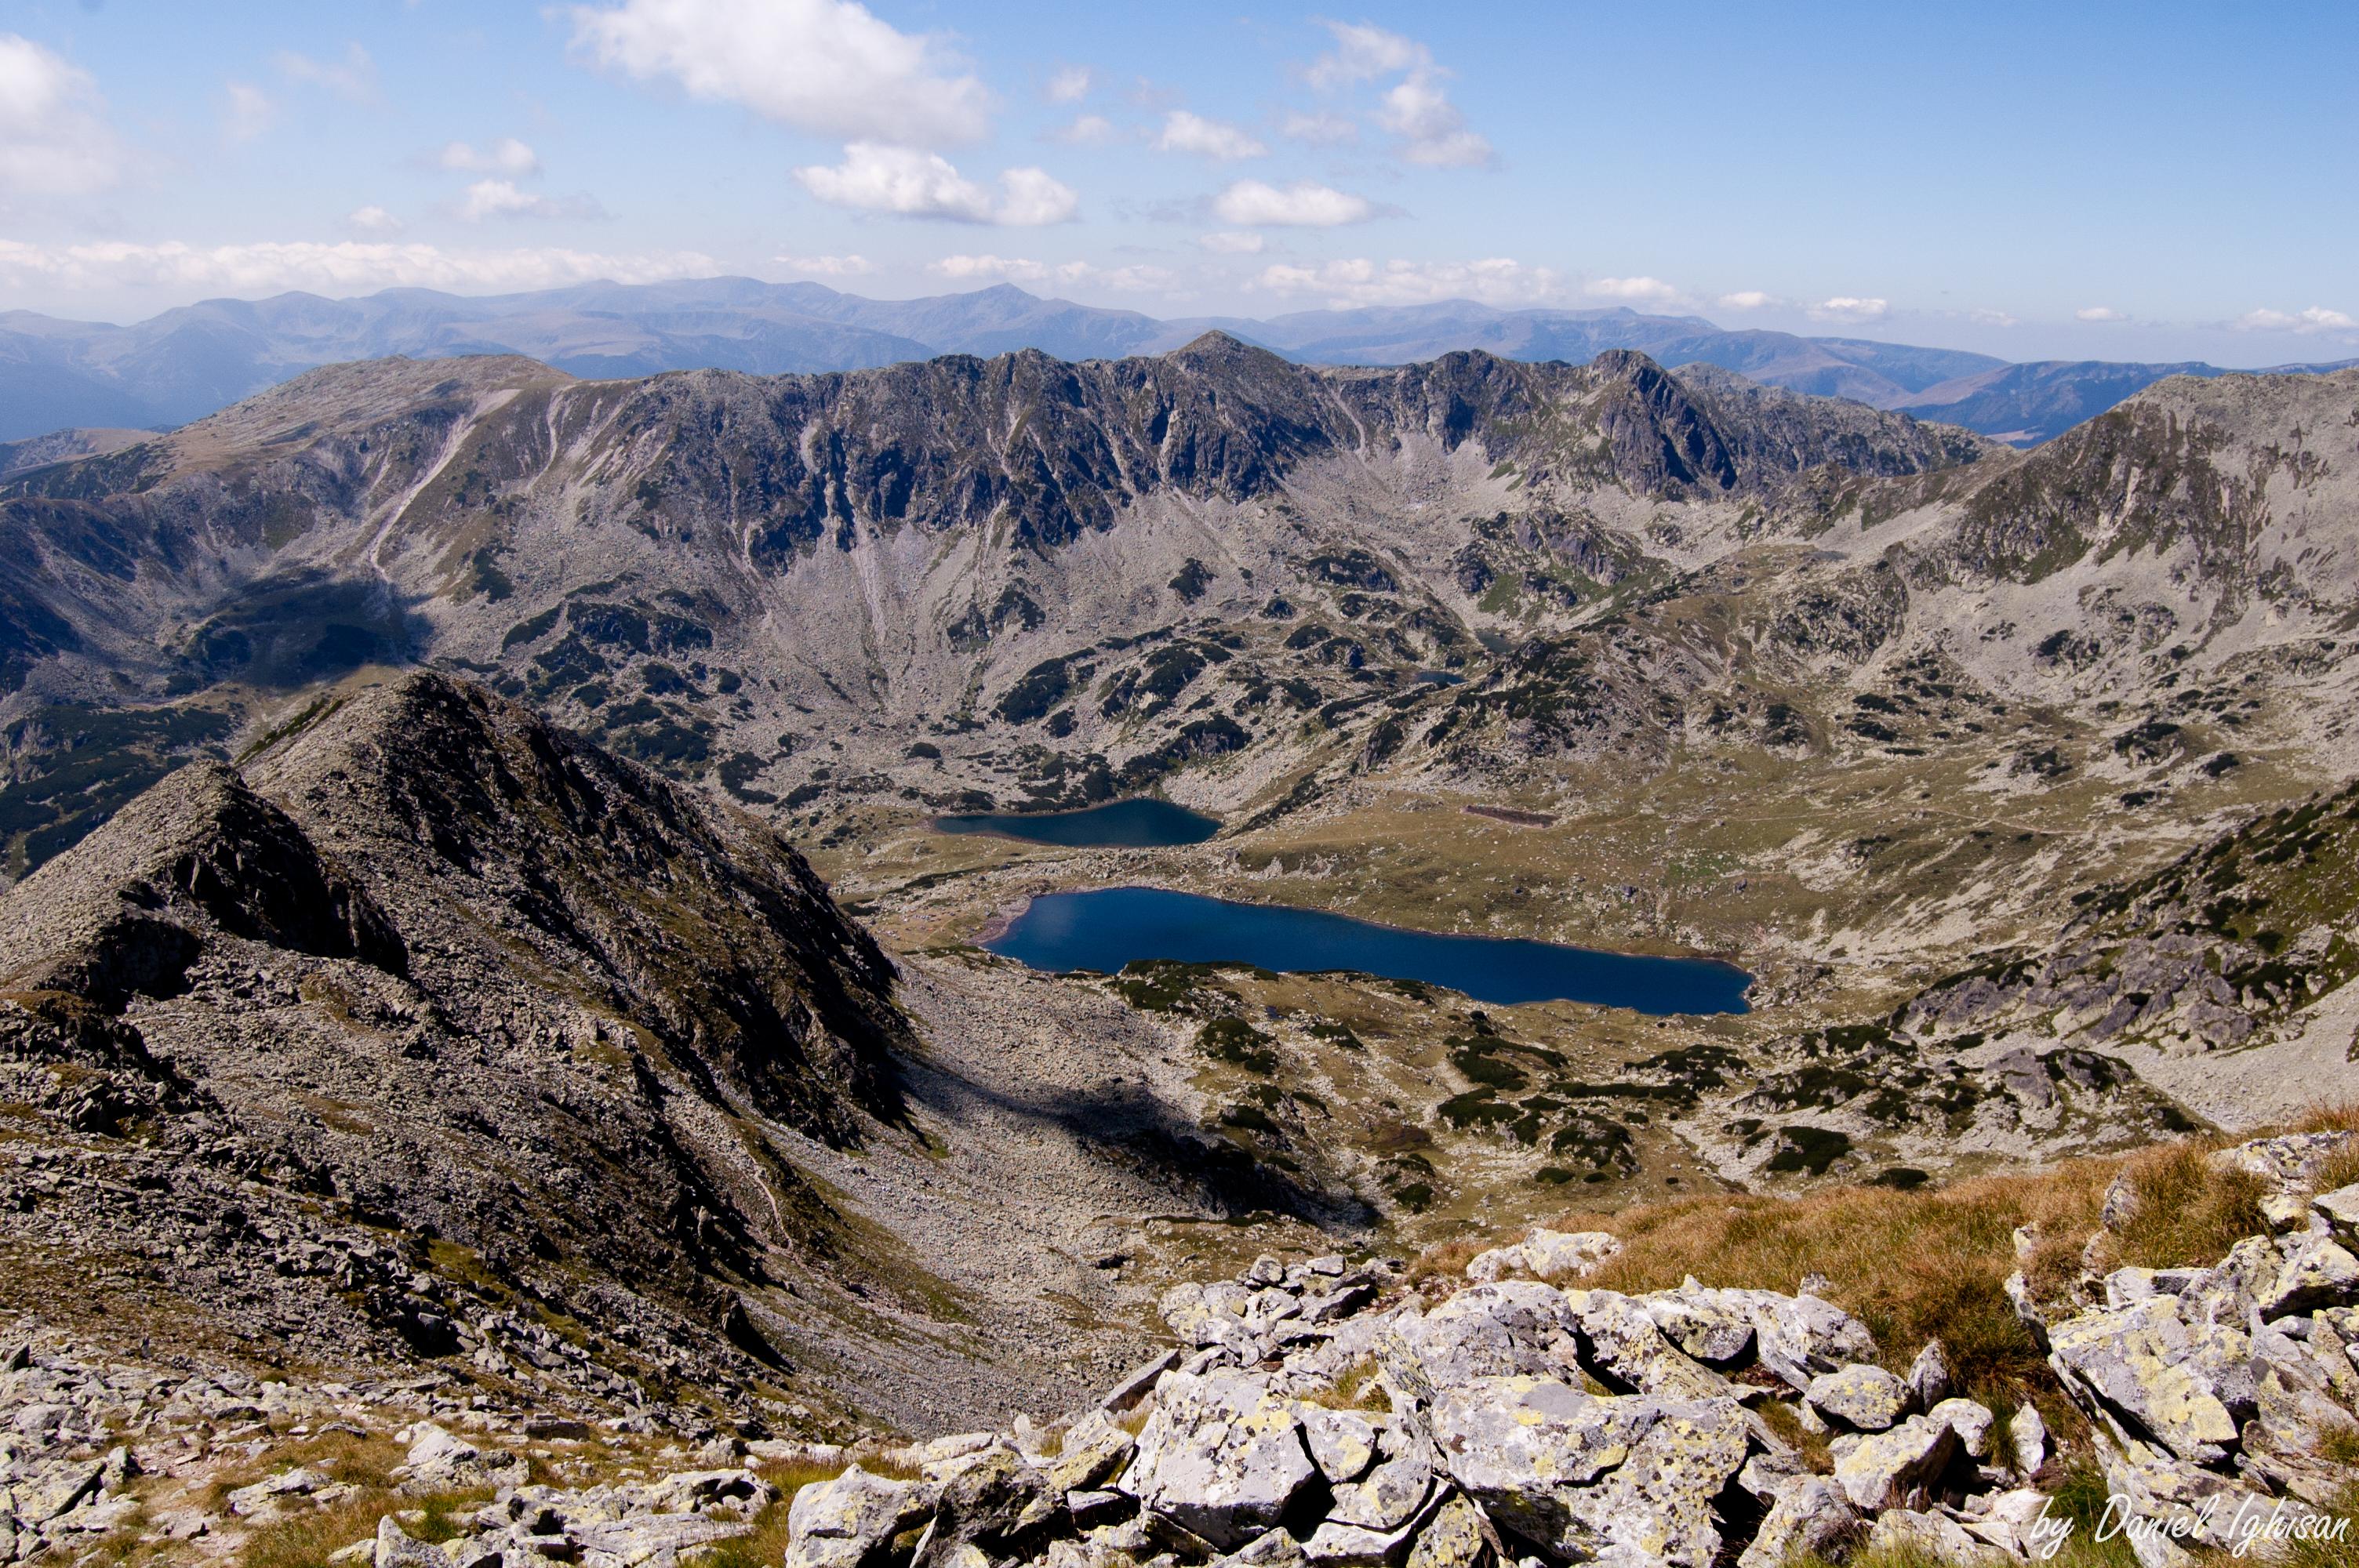 Munții Retezat Wikipedia